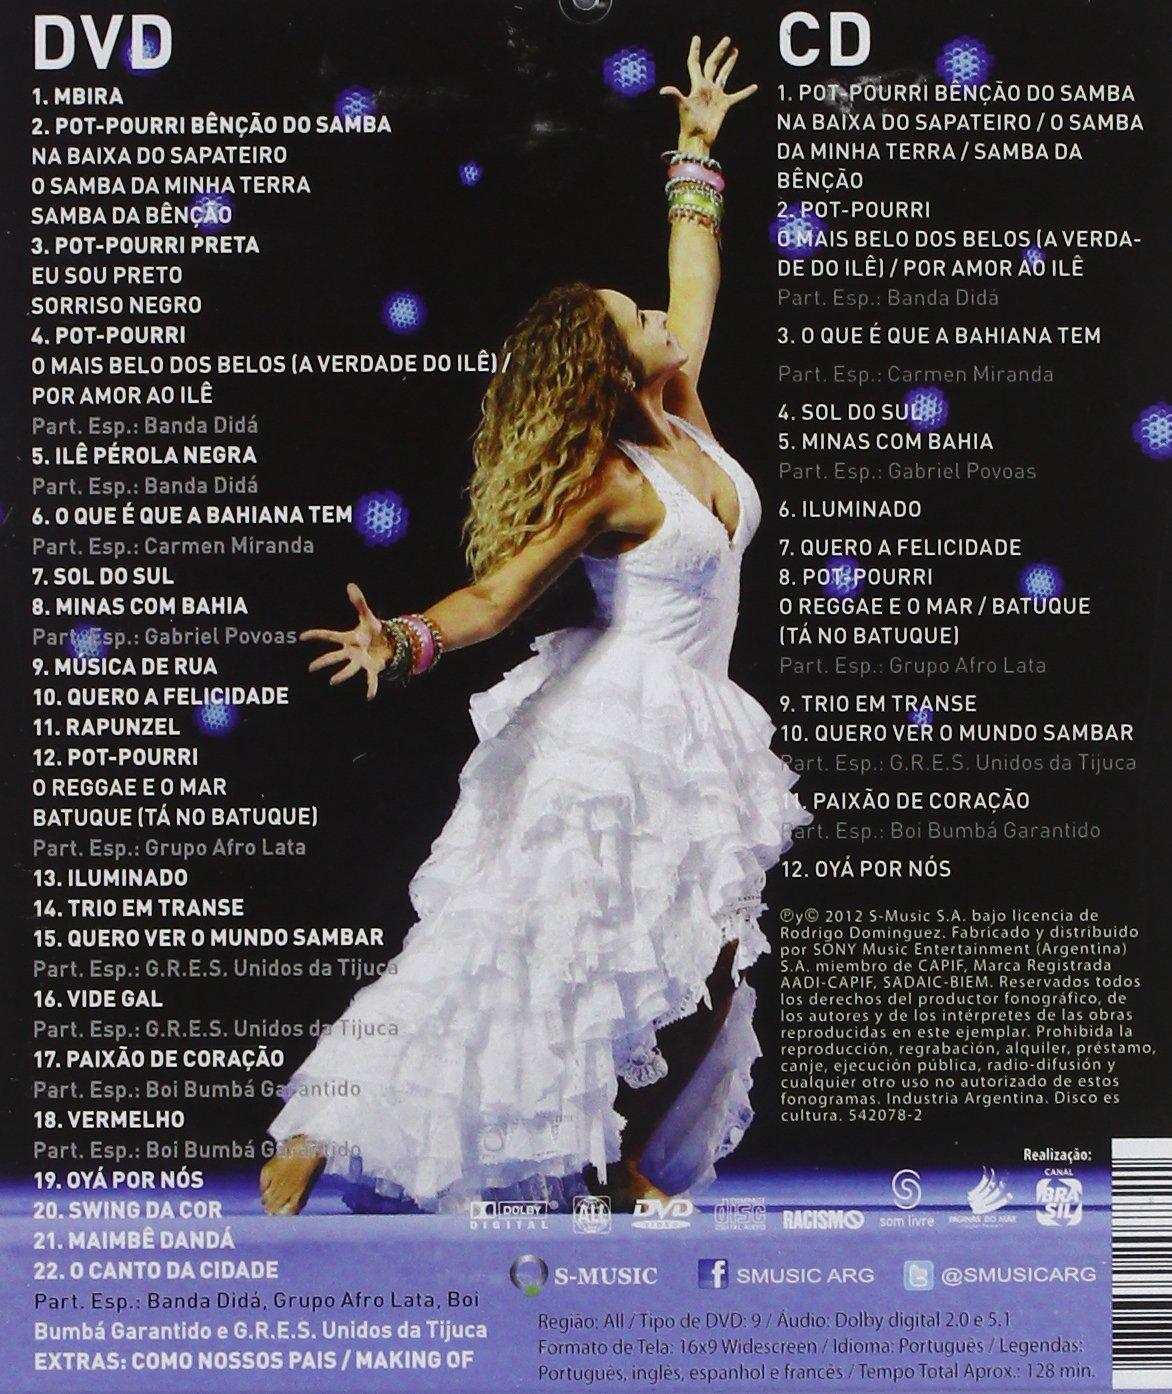 dvd caniblia ritmos do brasil